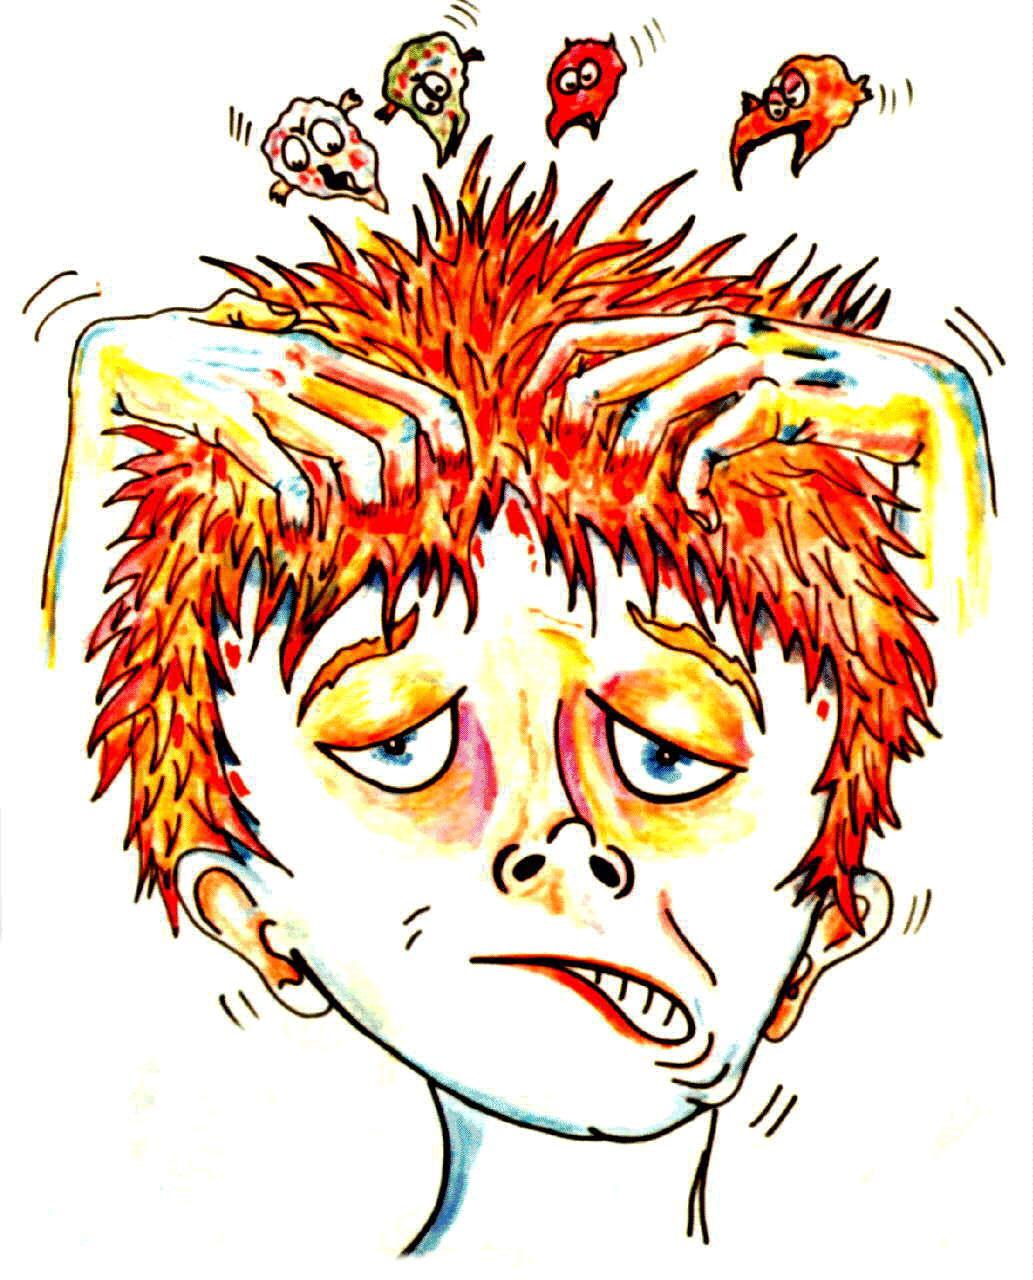 http://2.bp.blogspot.com/_fqHVyeCGAz0/S9Xk7jek--I/AAAAAAAAAYU/KmJvPExhxKs/s1600/sintoma.jpg